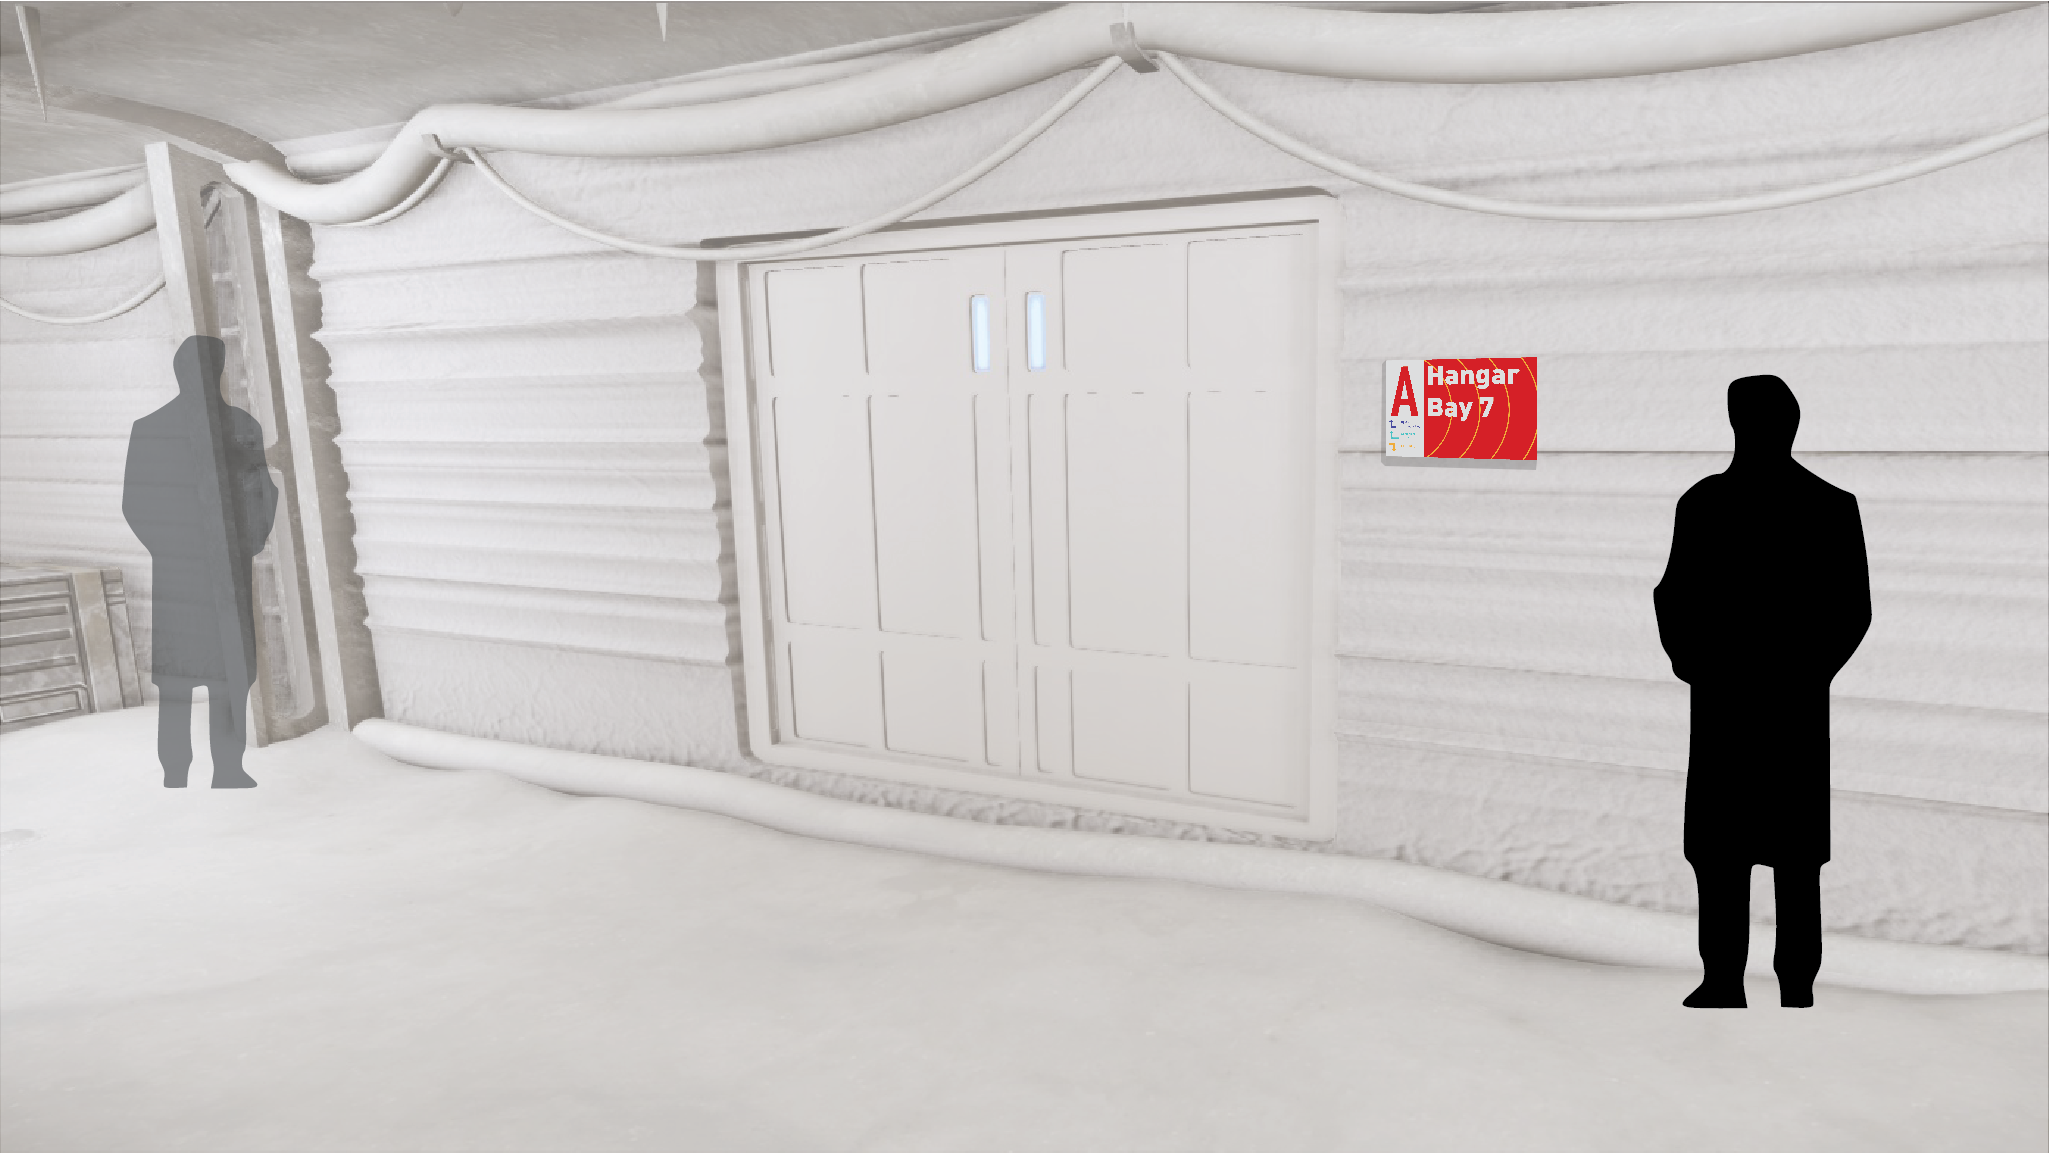 Echo Base Door Sign Context